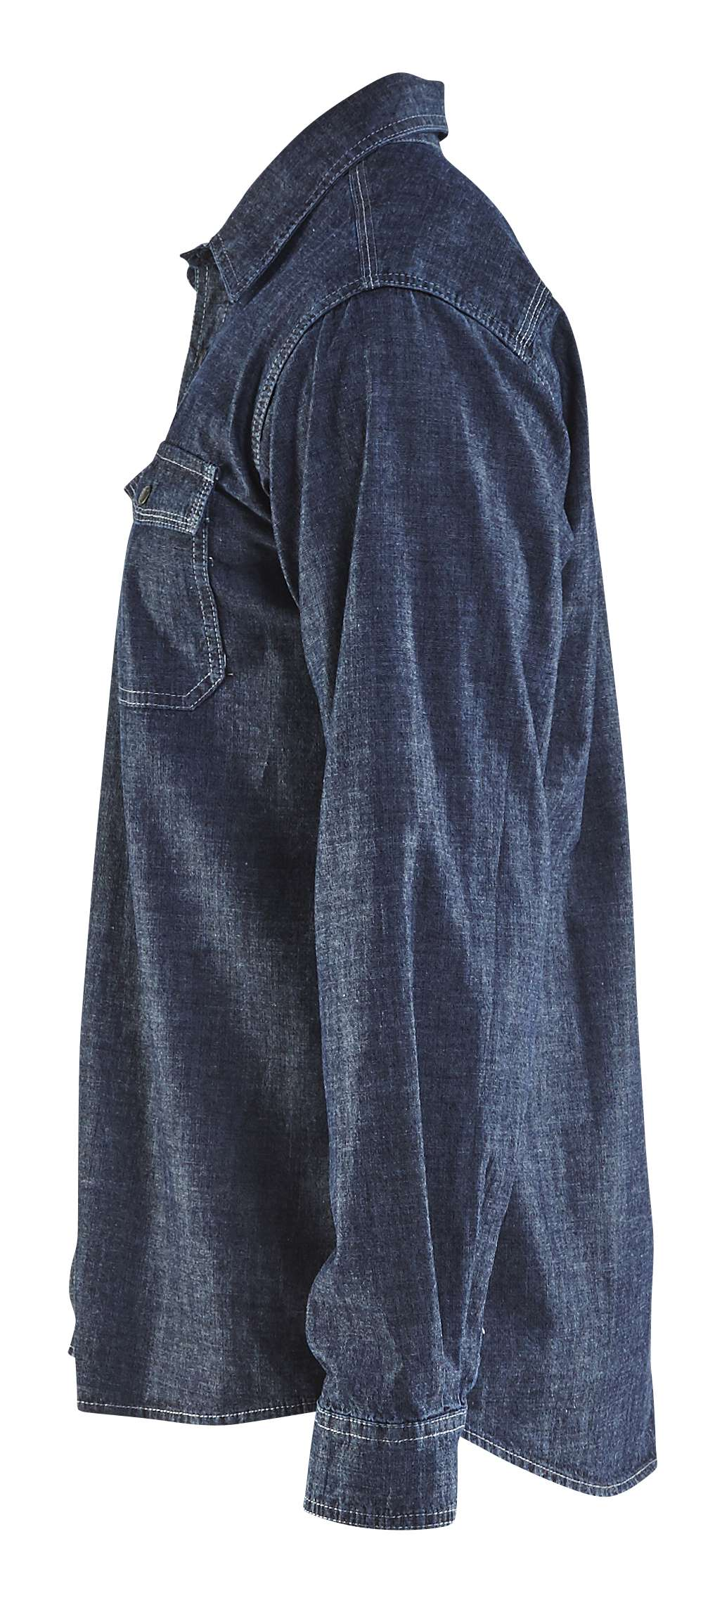 Blaklader Overhemden 32951129 marineblauw(8900)